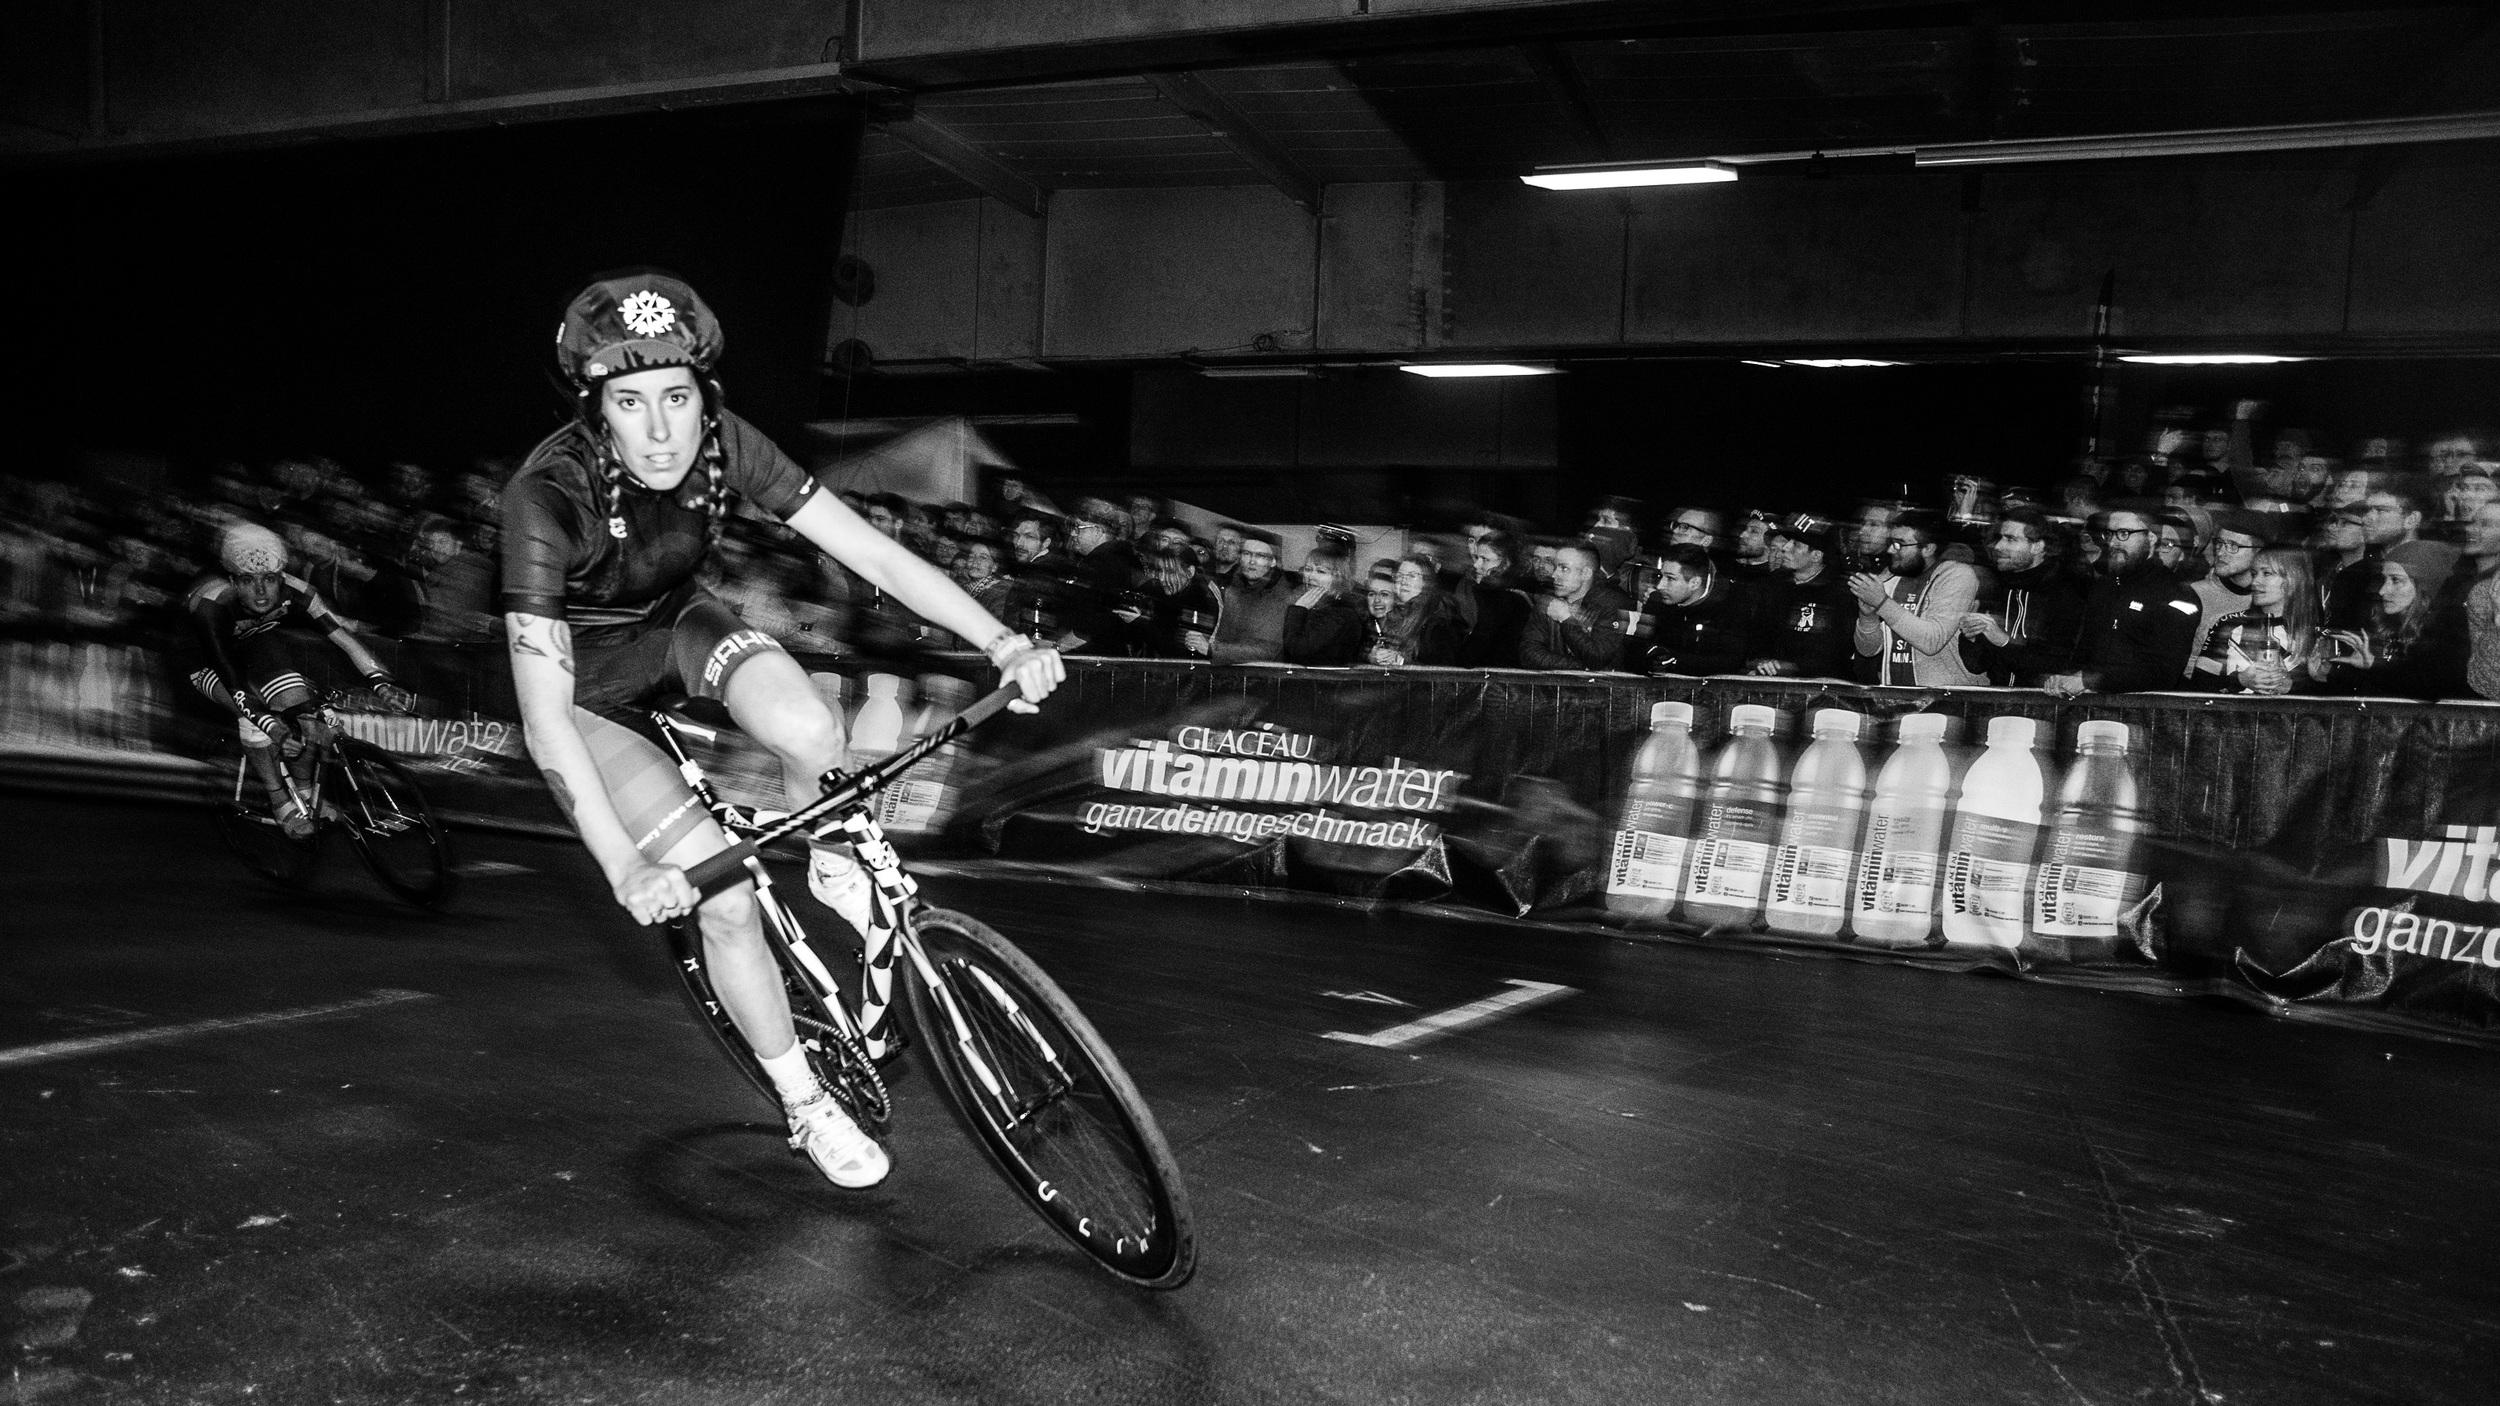 RAD RACE Last Man Standing, Berlin March 19 2016 - Shot by Drew Kaplan 56.jpg